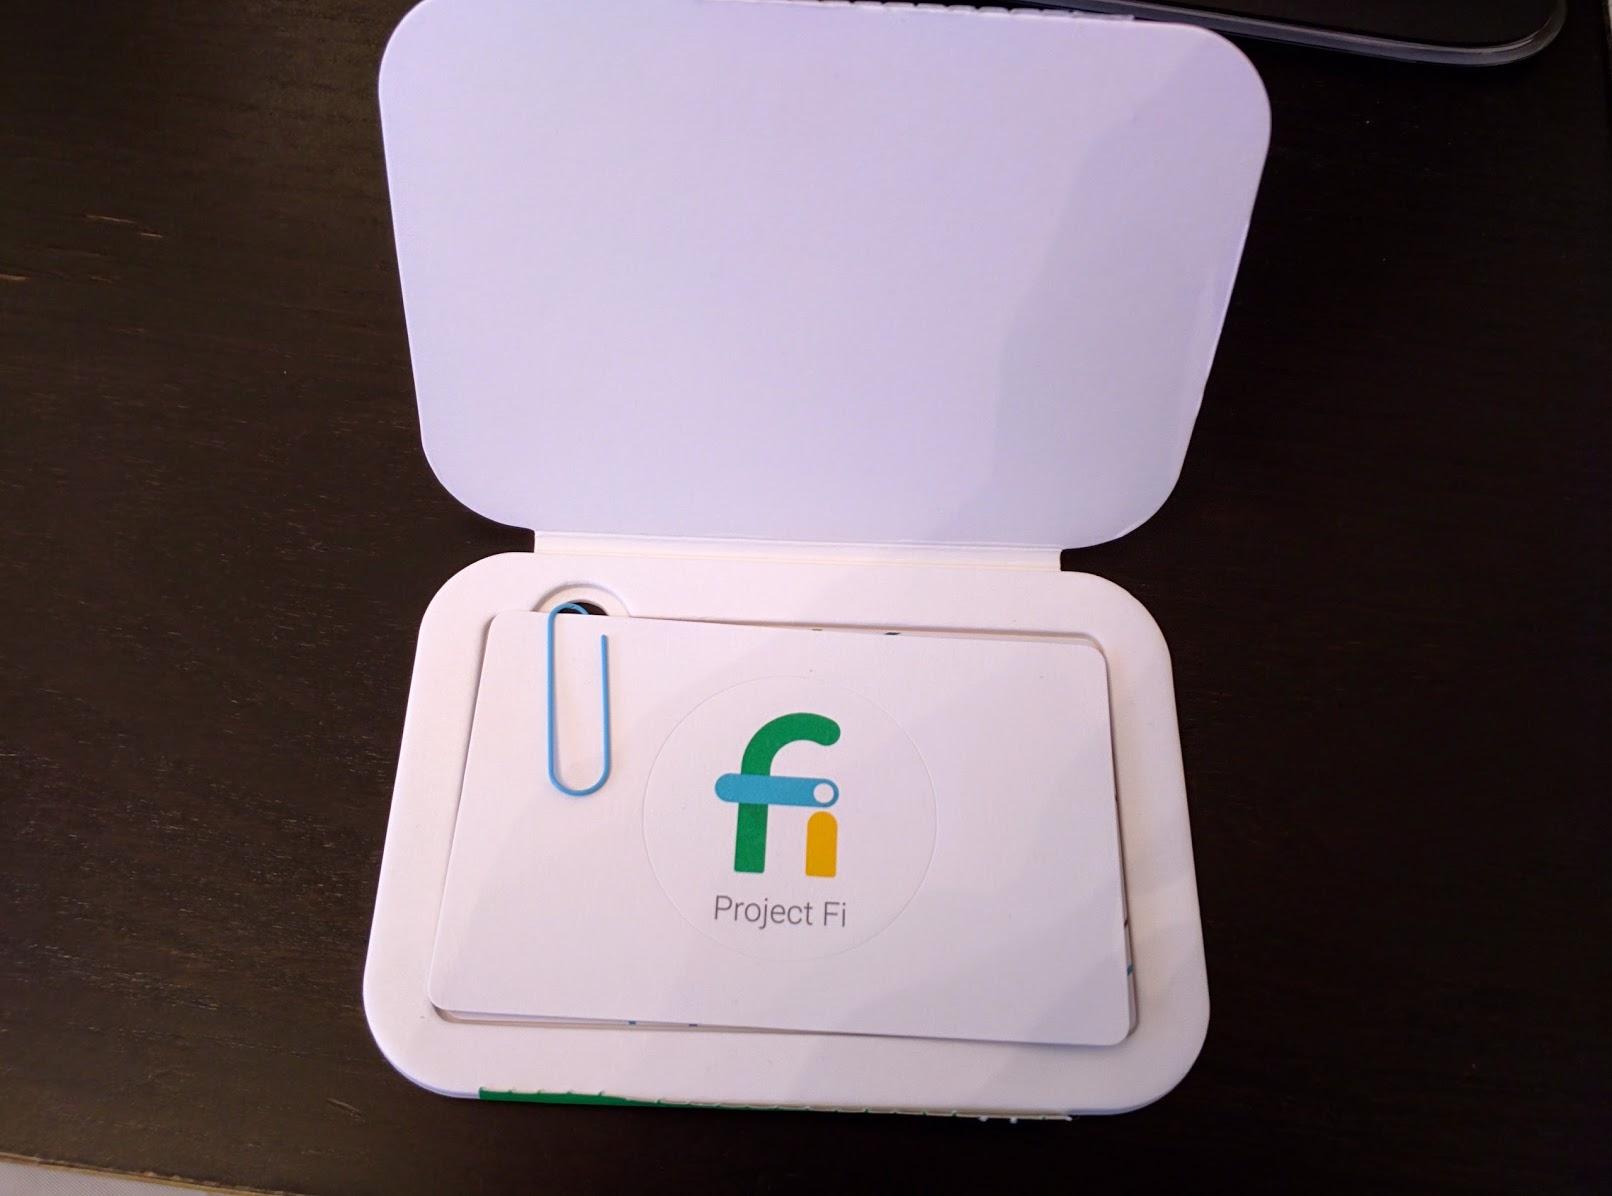 Google's Project Fi gets an improved VPN service | TechCrunch